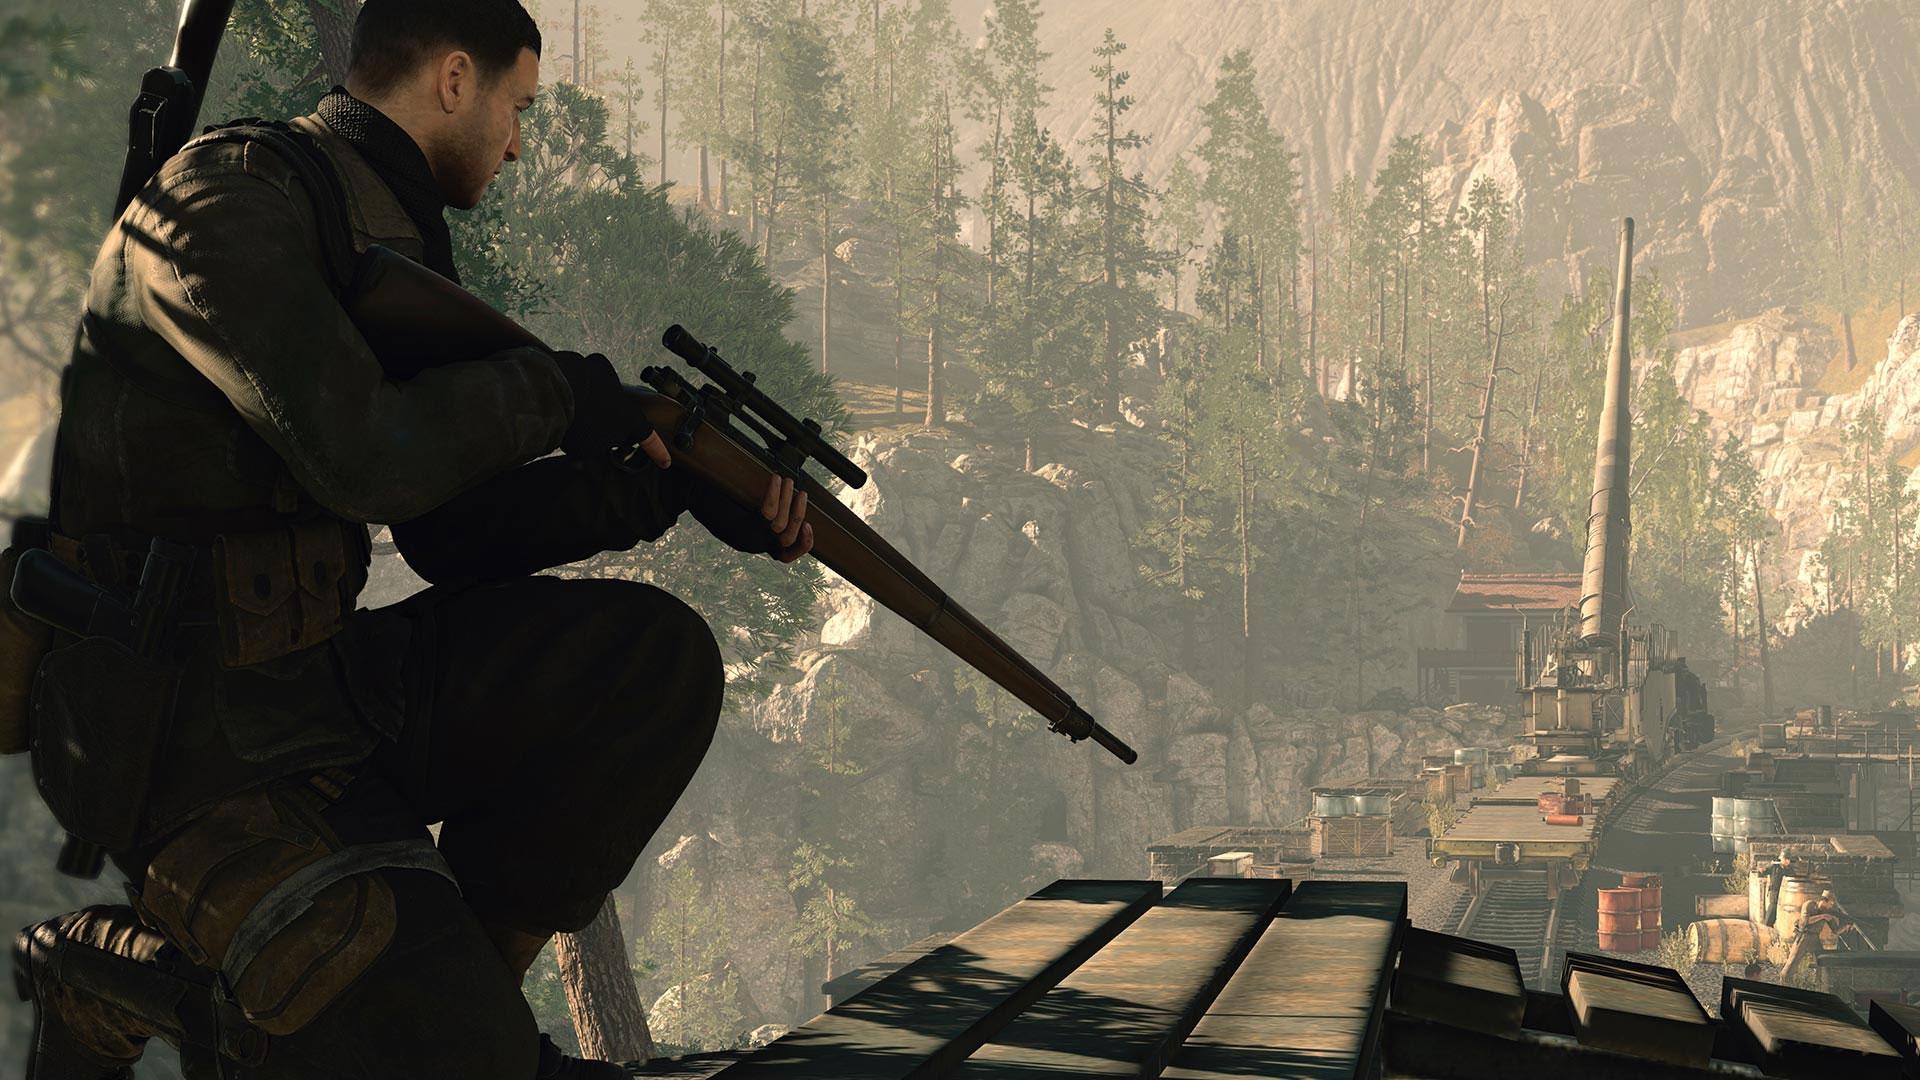 Sniper Elite 4 Wallpapers in Ultra HD 4K   Gameranx 1920x1080